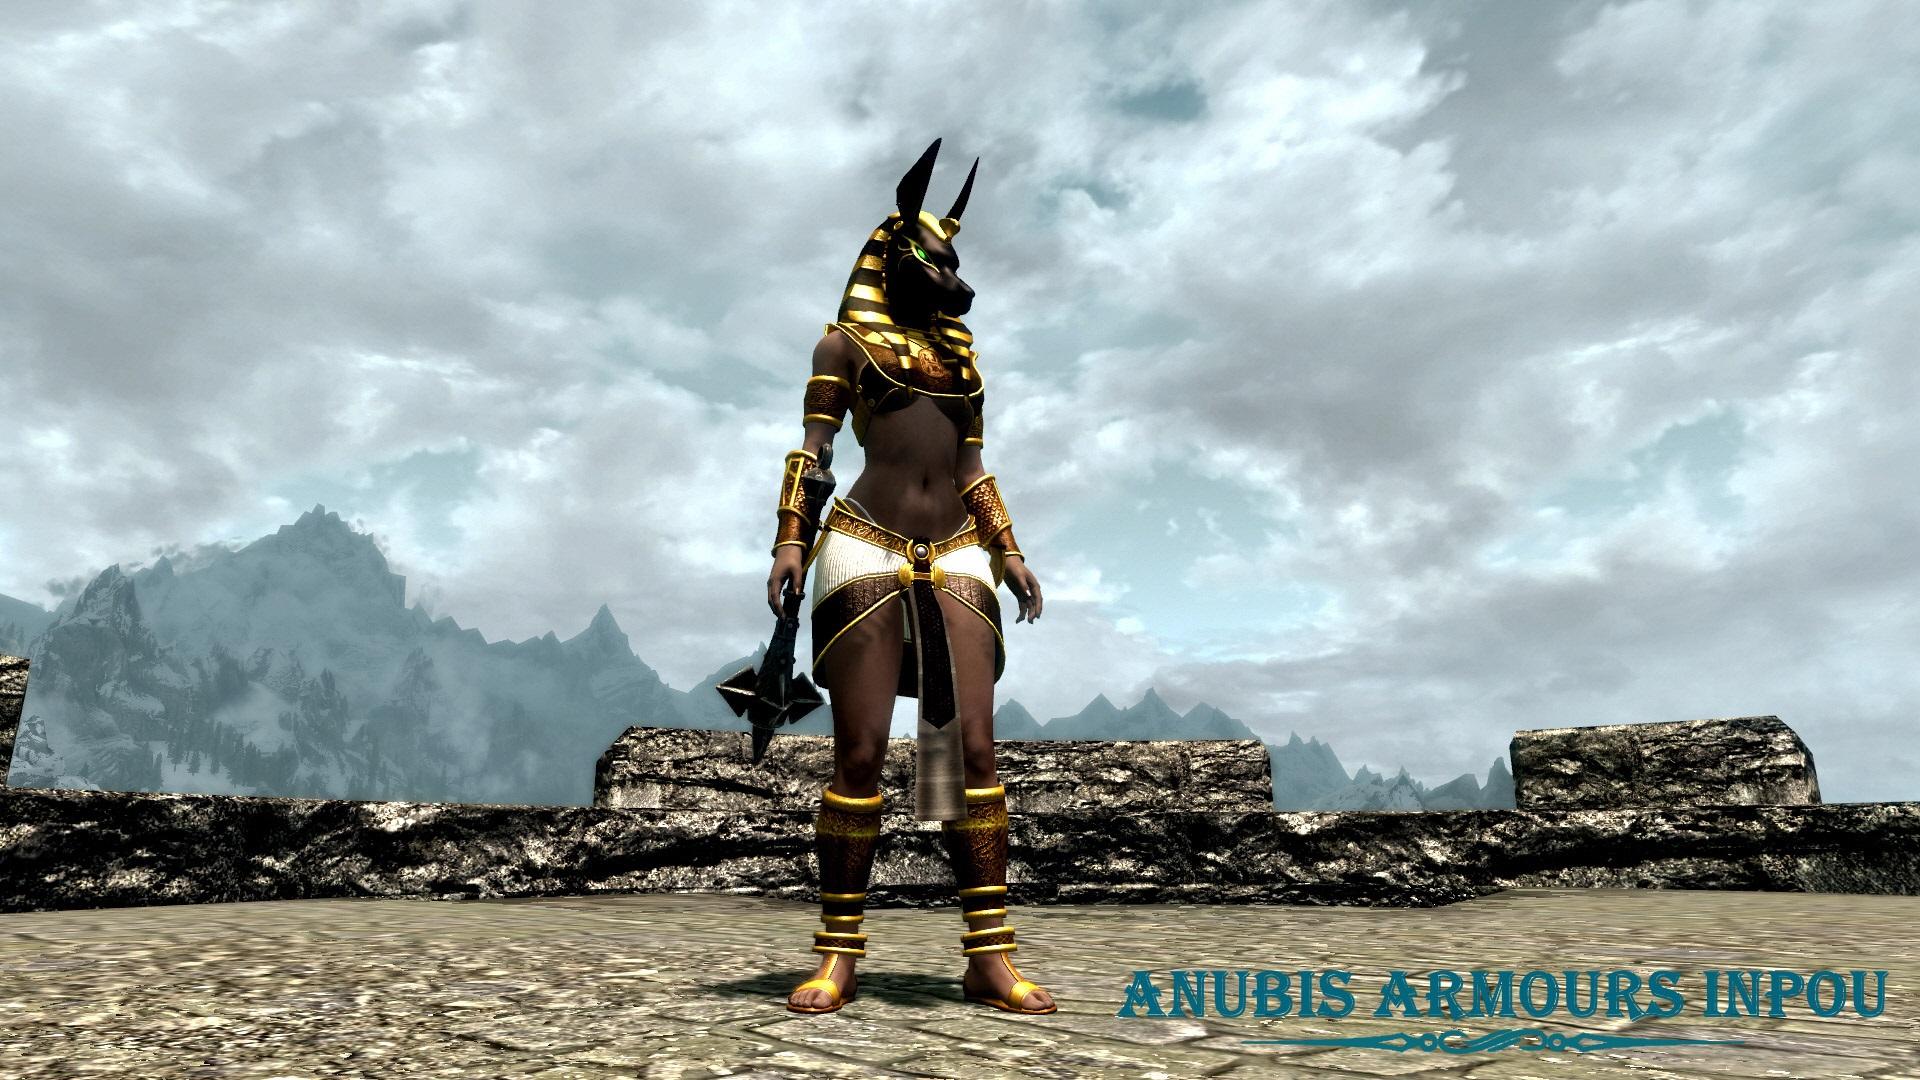 Anubis_Armours_Inpou_by_Neo_00.jpg